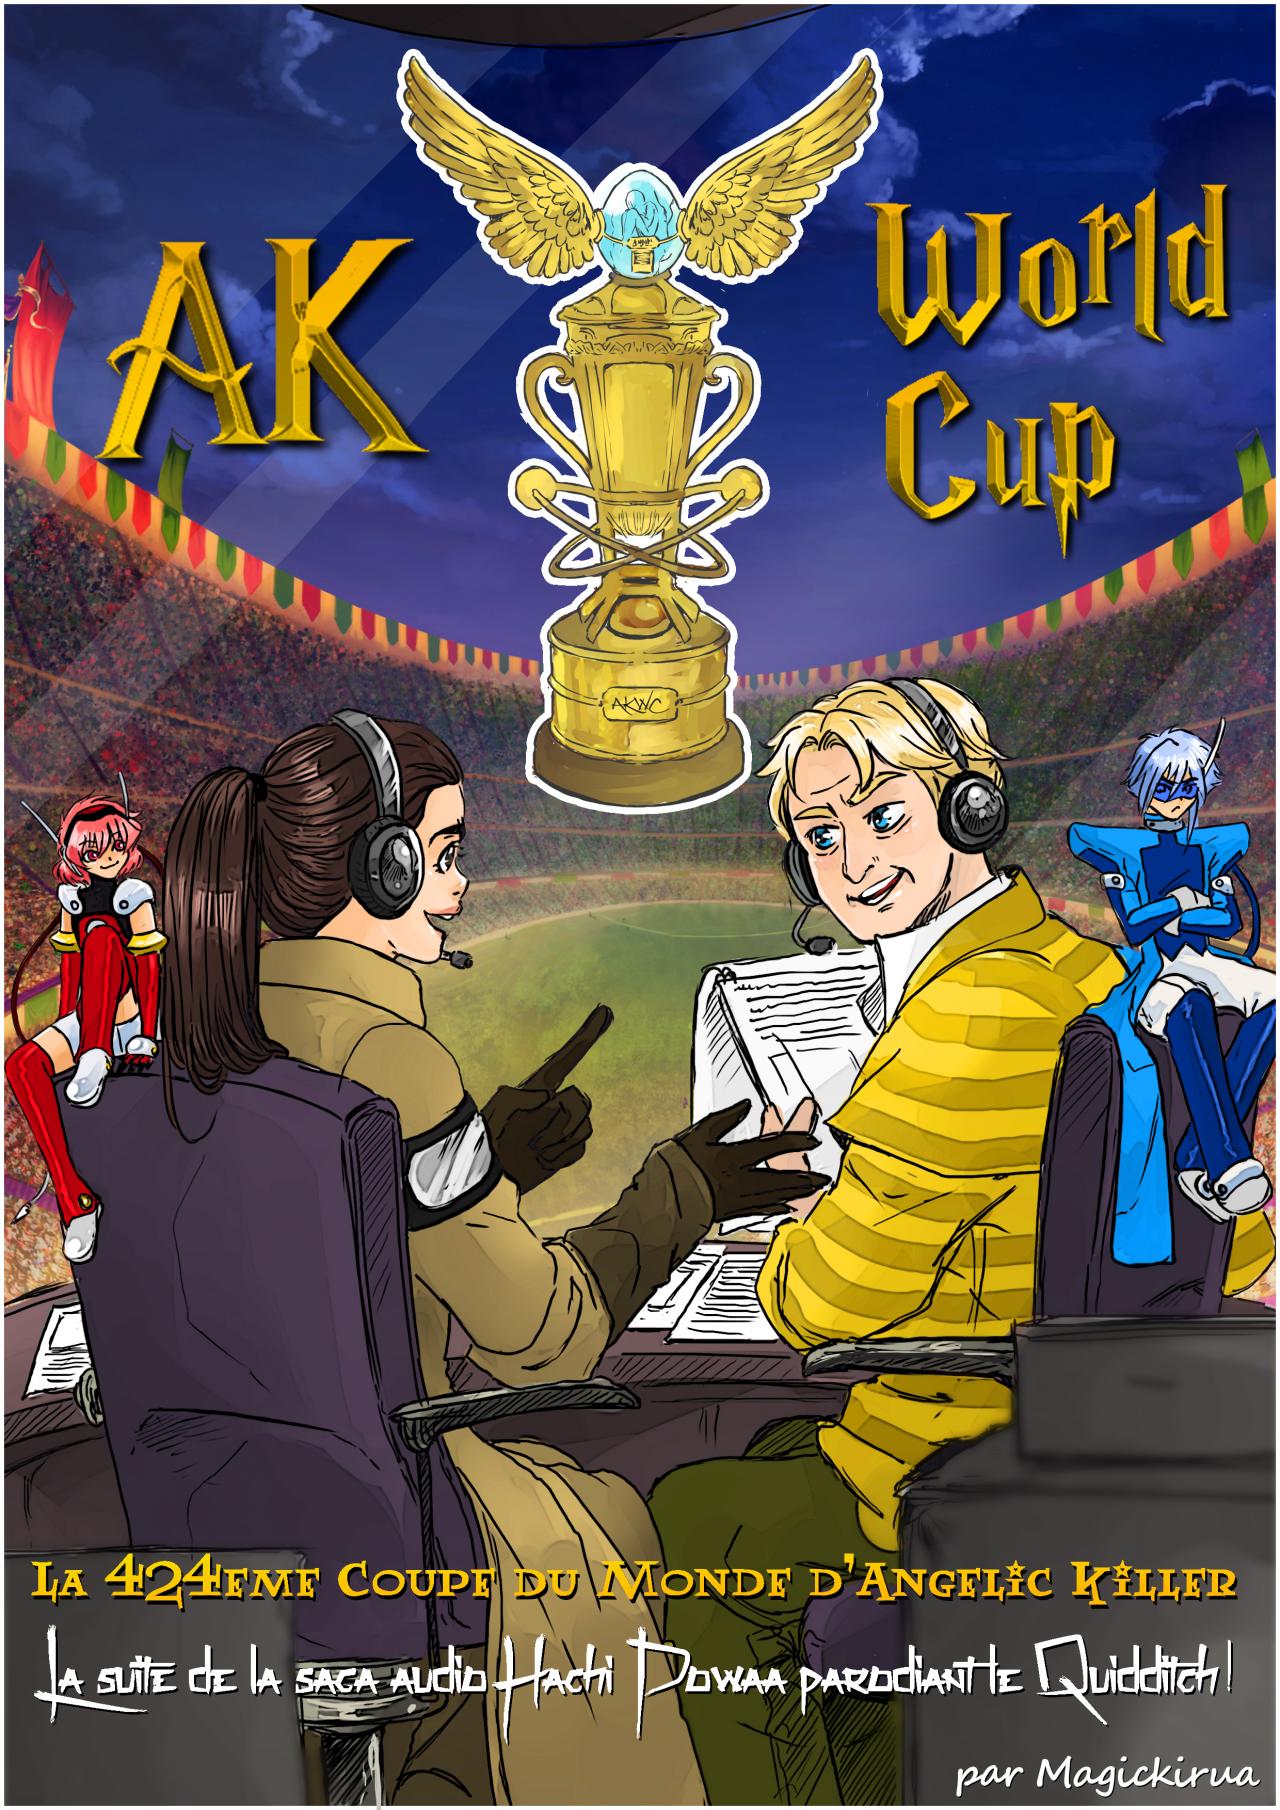 AK World Cup Poster